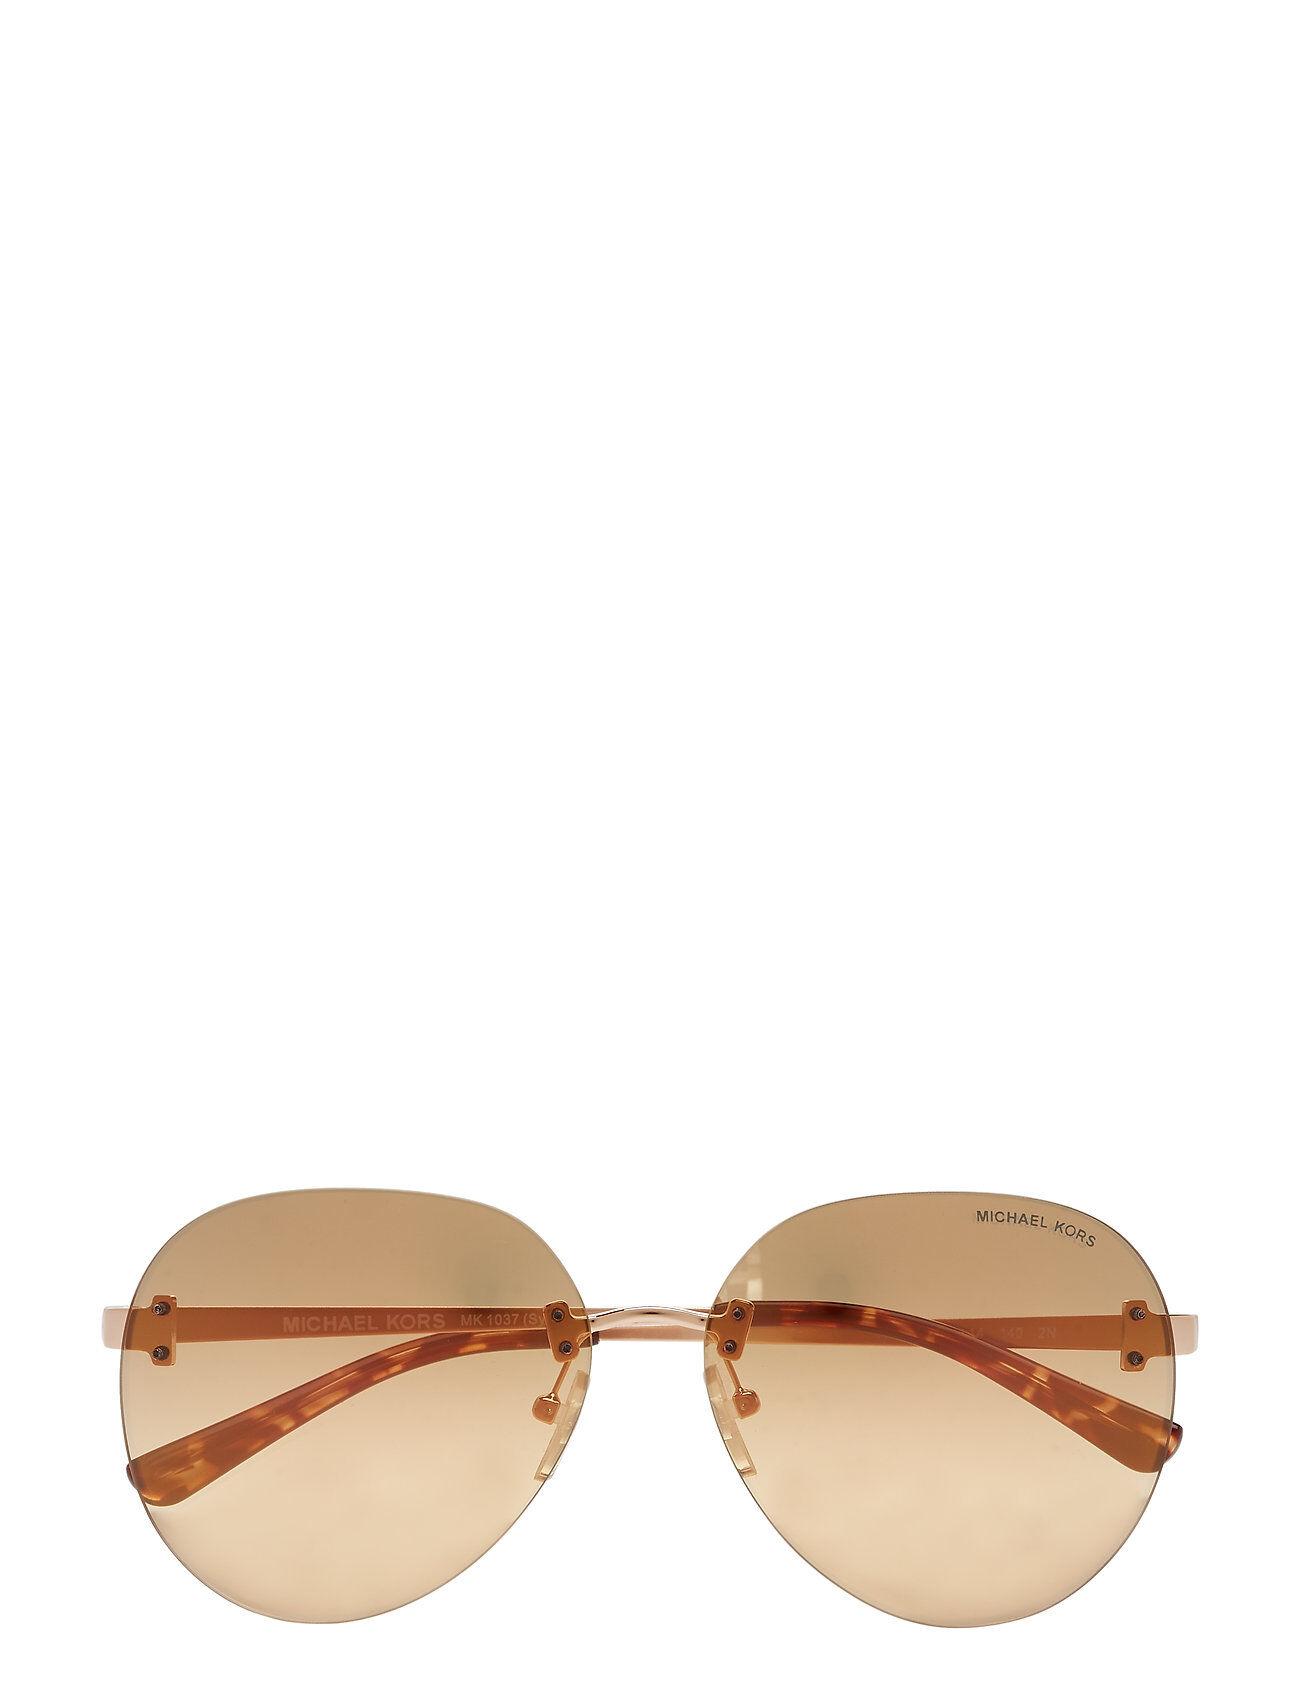 Michael Kors Sunglasses Sydney